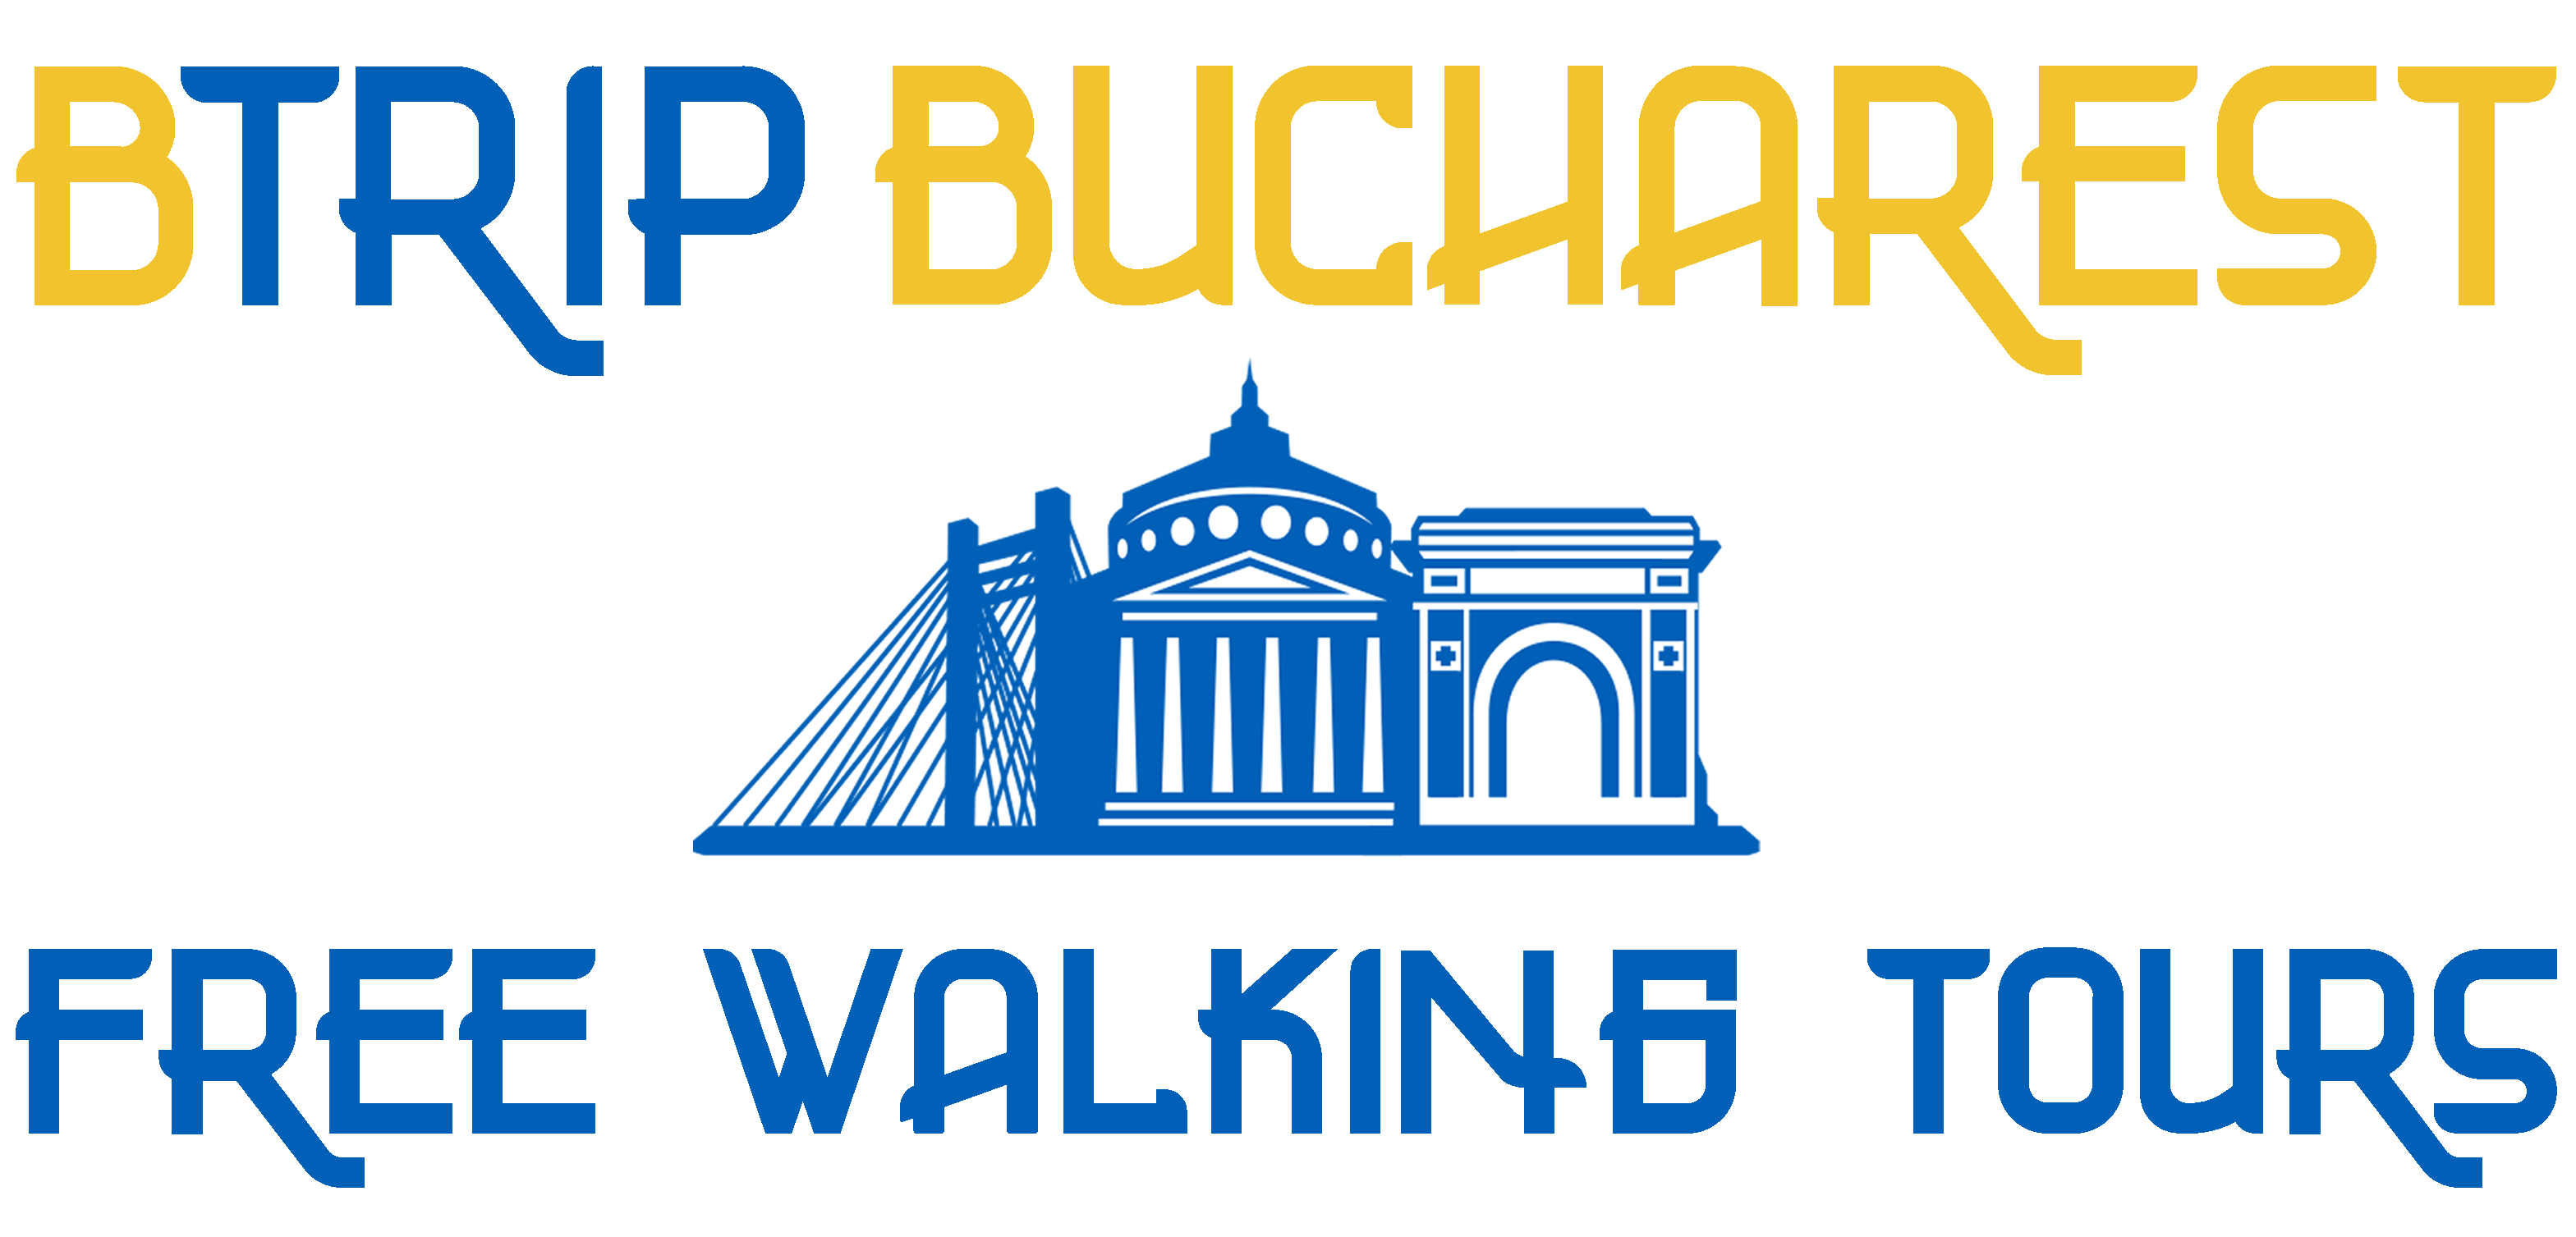 BTrip Bucharest Free Walking Tours